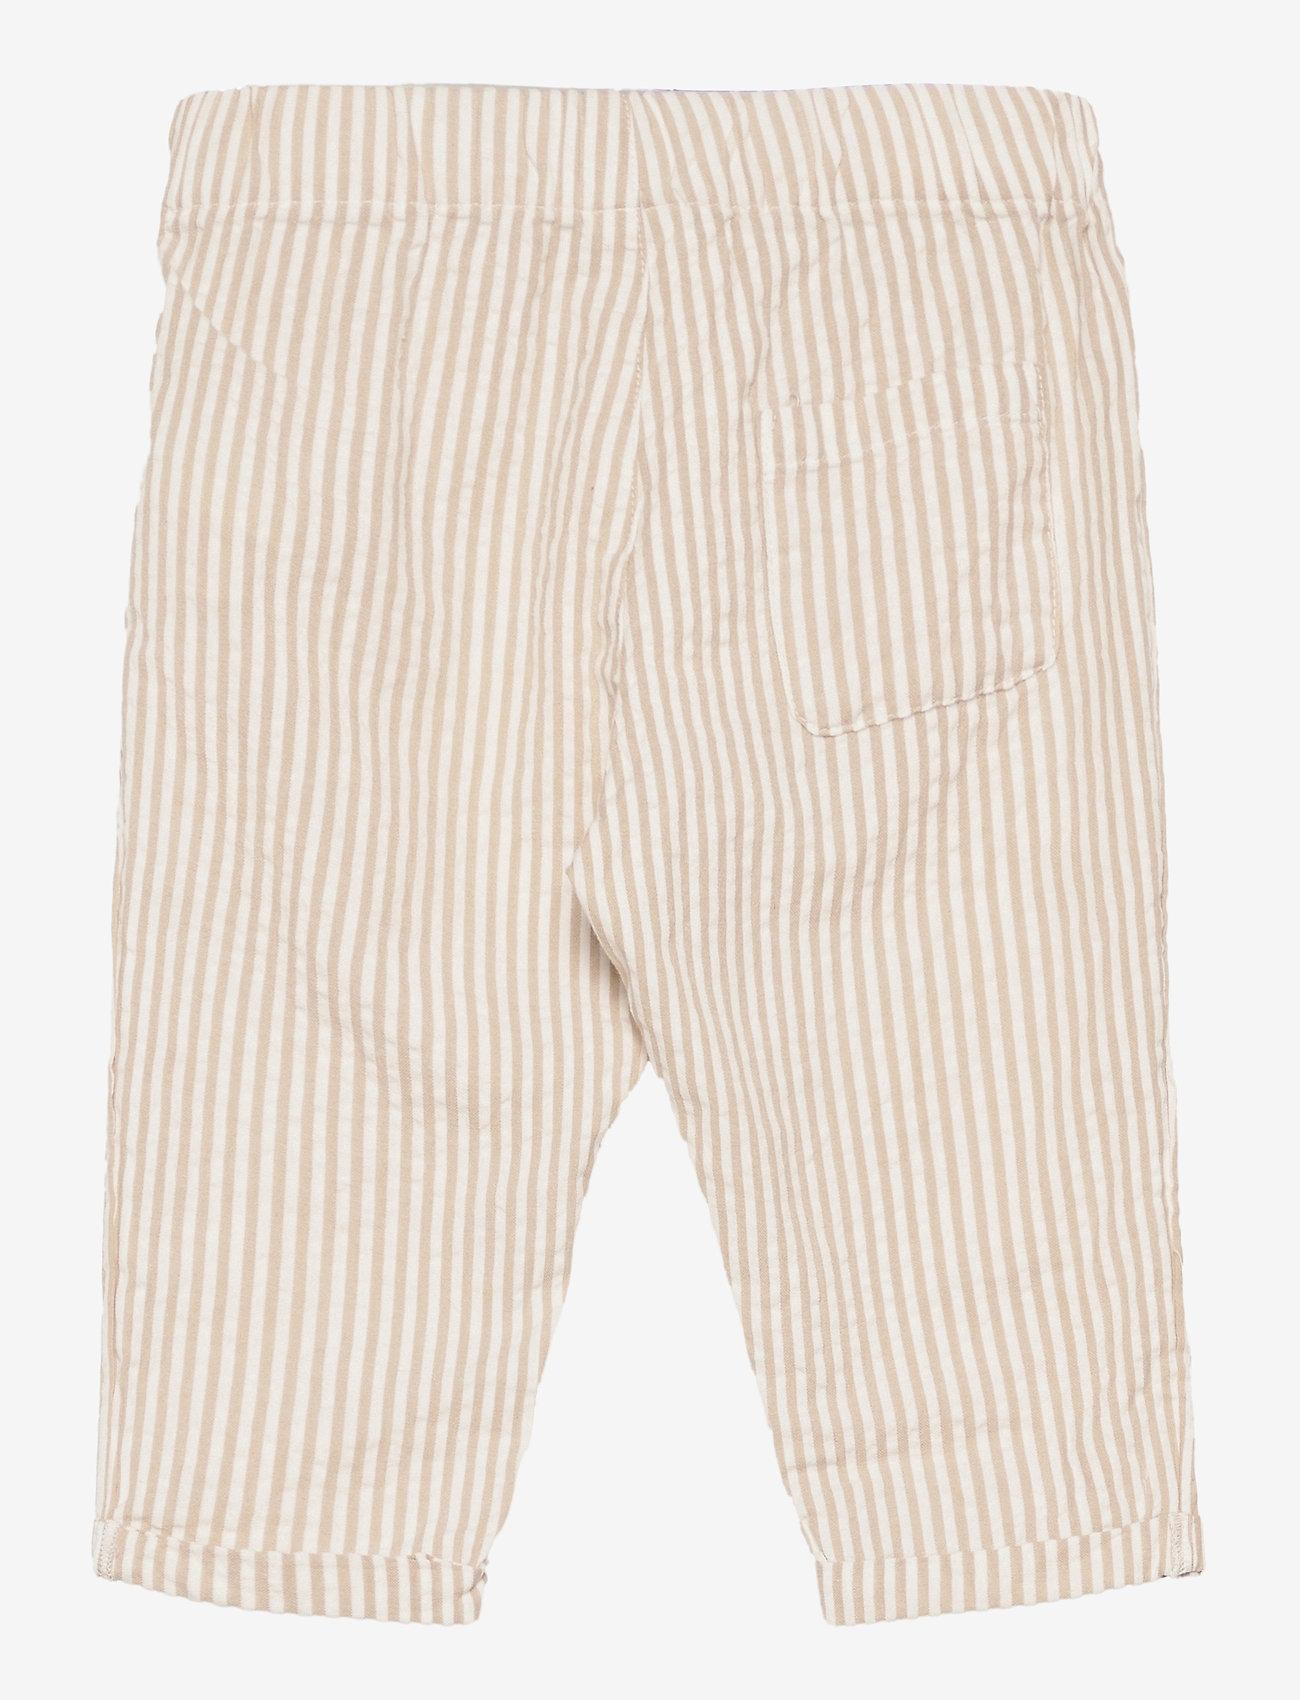 Lindex - Trouser woven seersucker - trousers - beige - 1